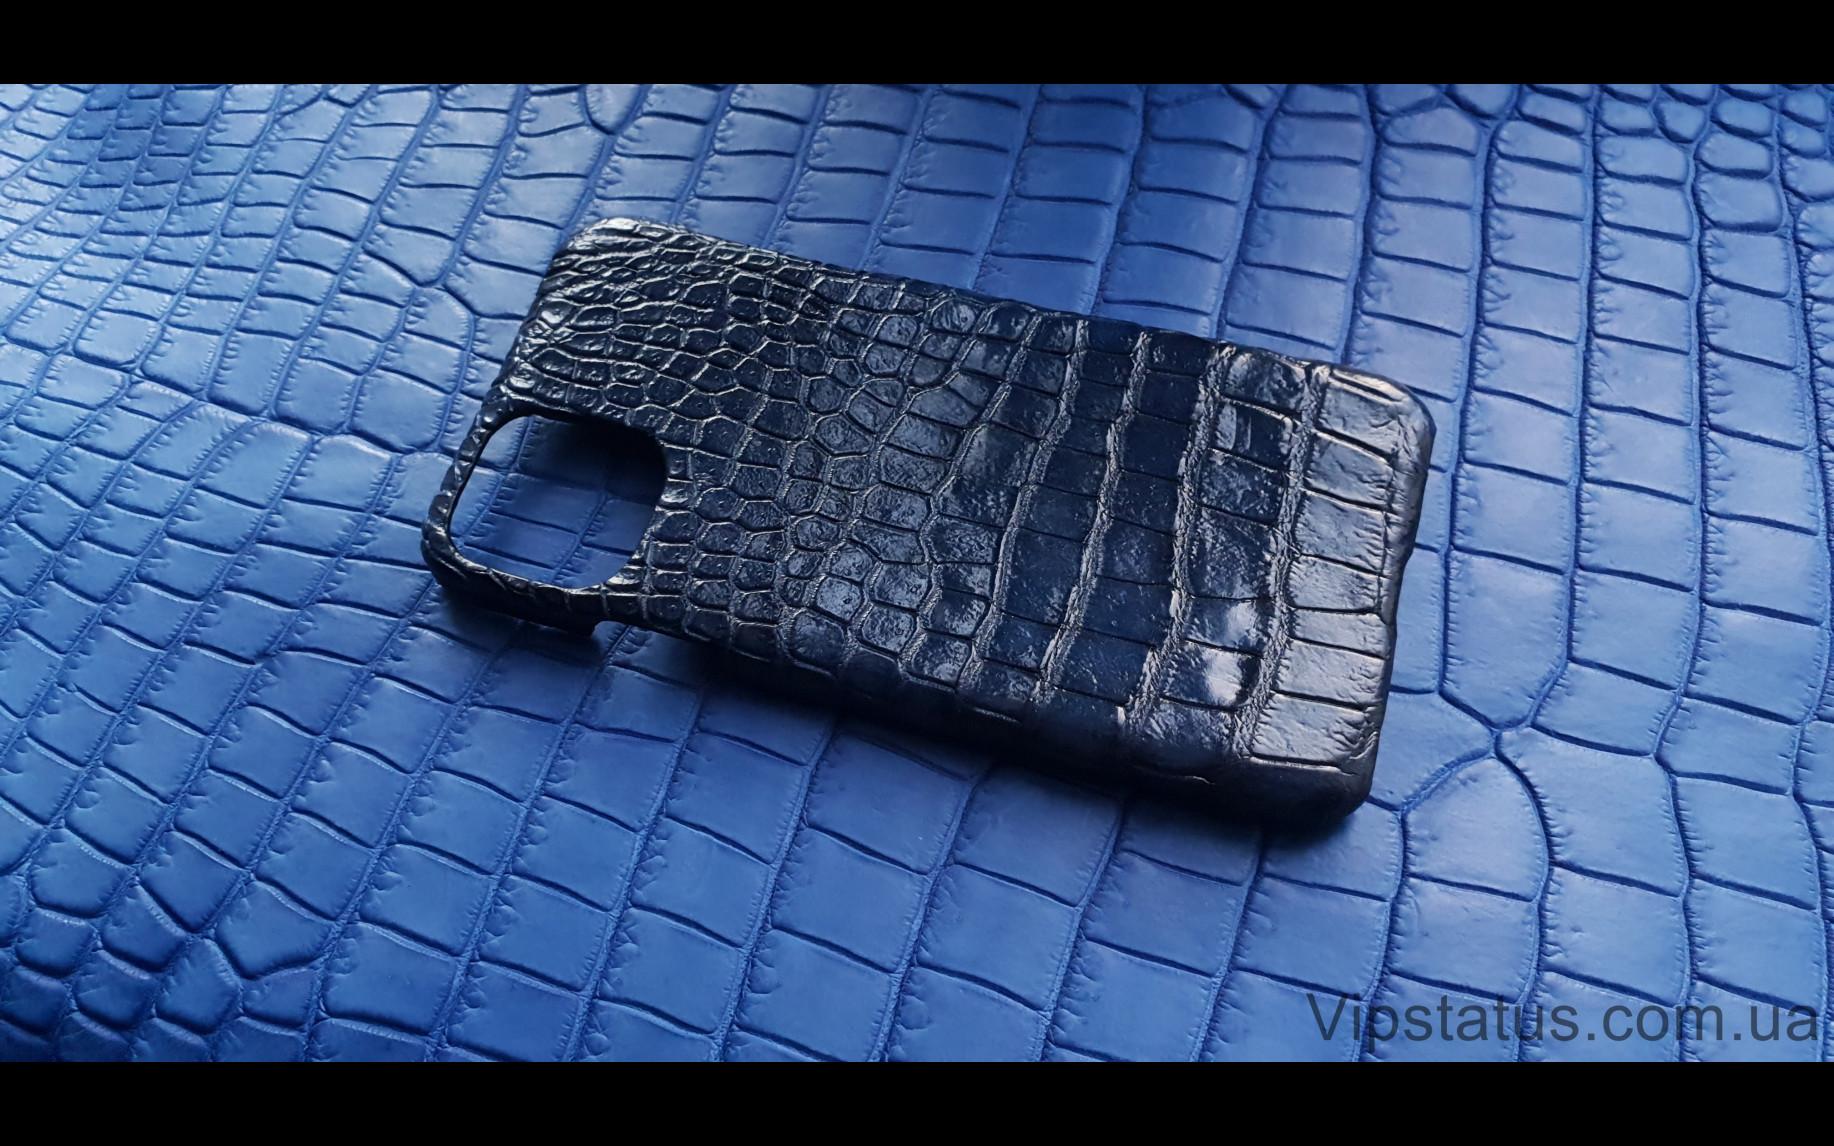 Elite Dark Blue Вип чехол IPhone 11 Pro Max кожа крокодила Dark Blue Vip case IPhone 11 Pro Max Crocodile leather image 2